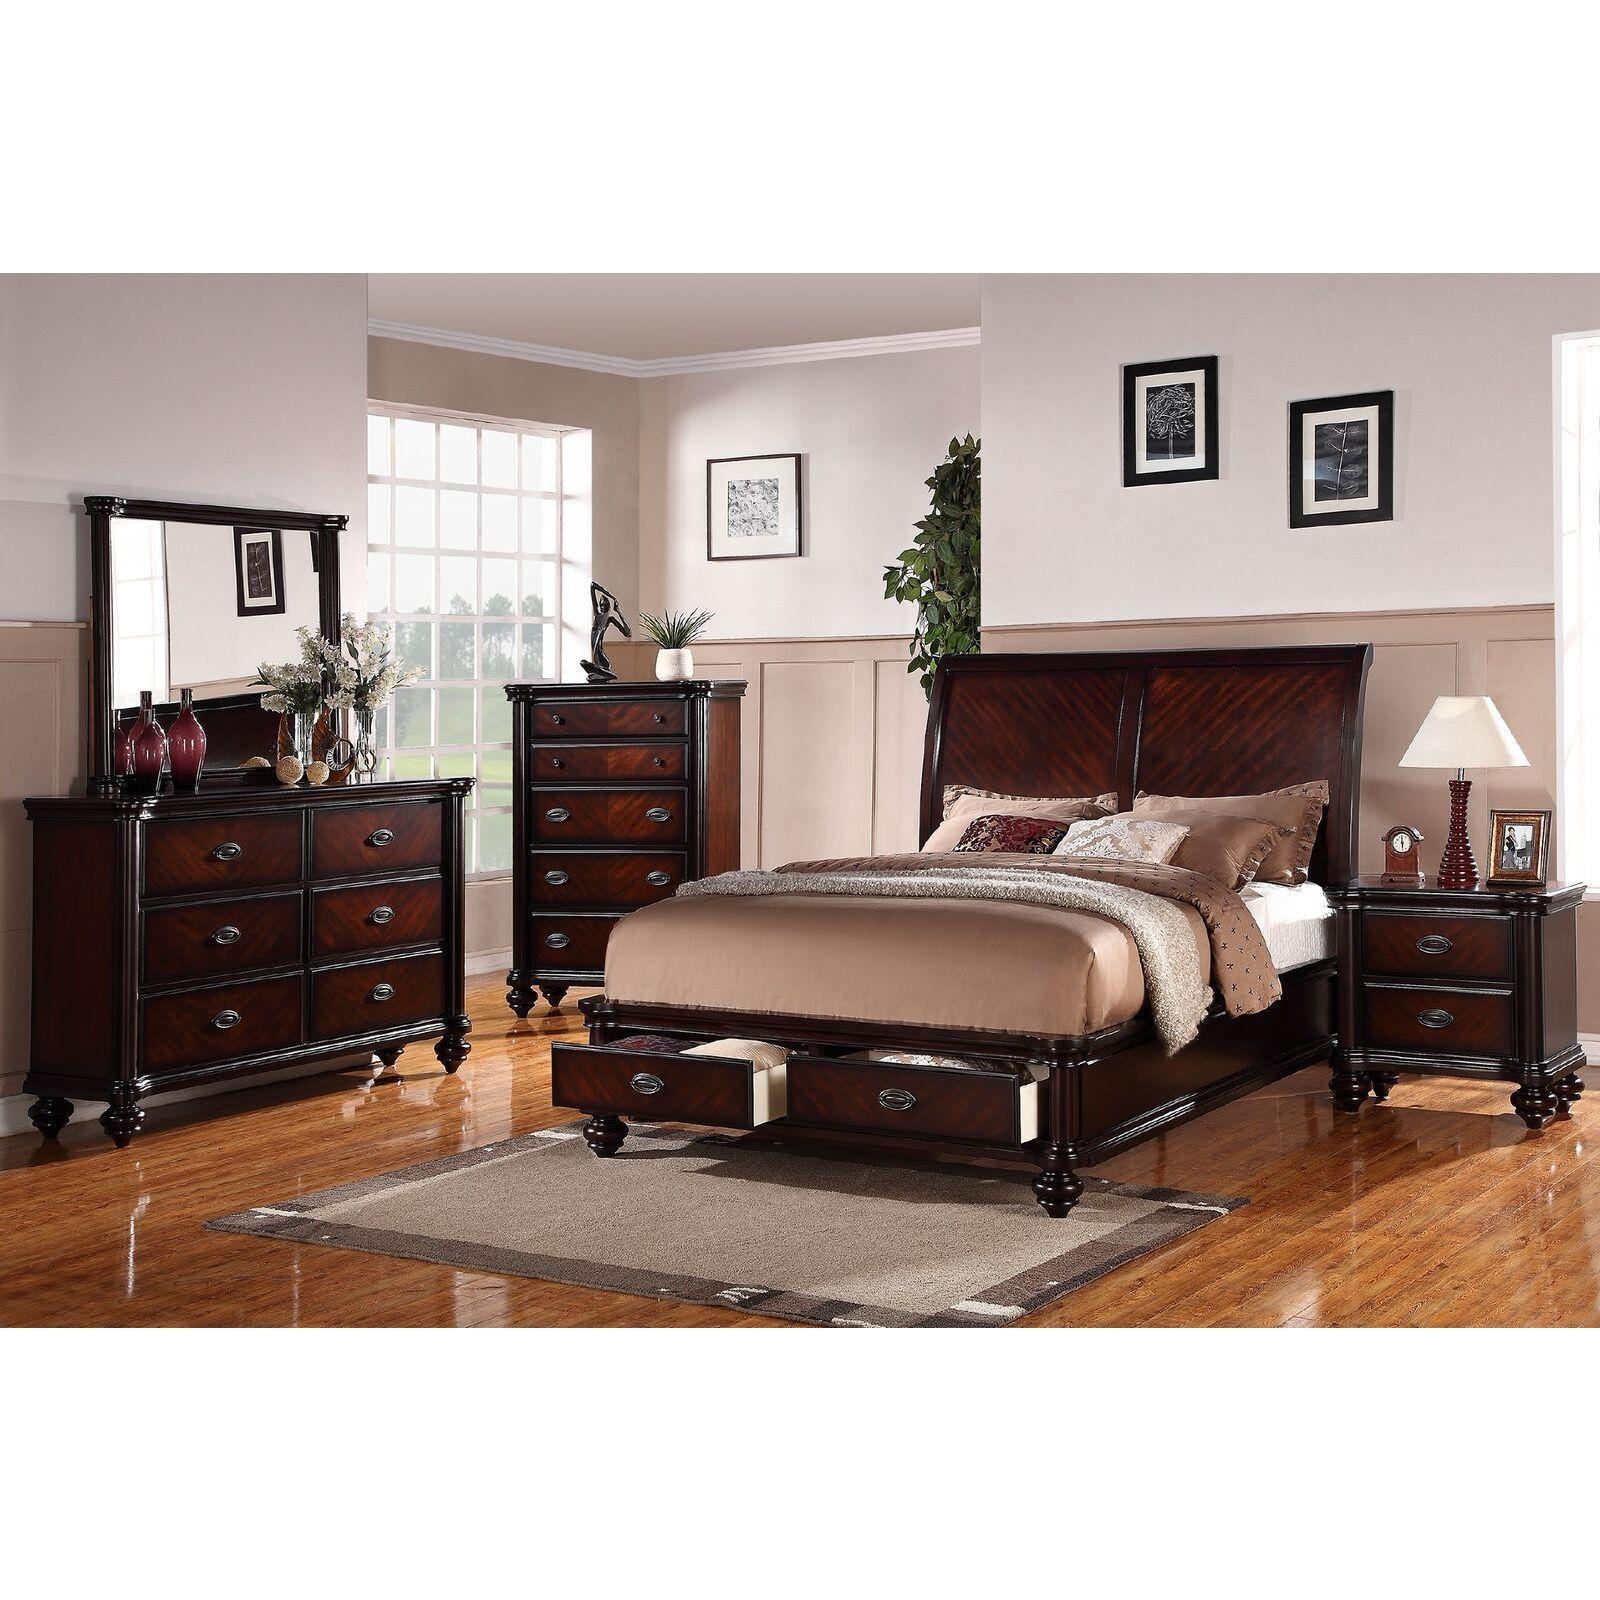 Anatolio cherry storage bed 4 piece bedroom set anatolio 4 piece california king bedroom set brown